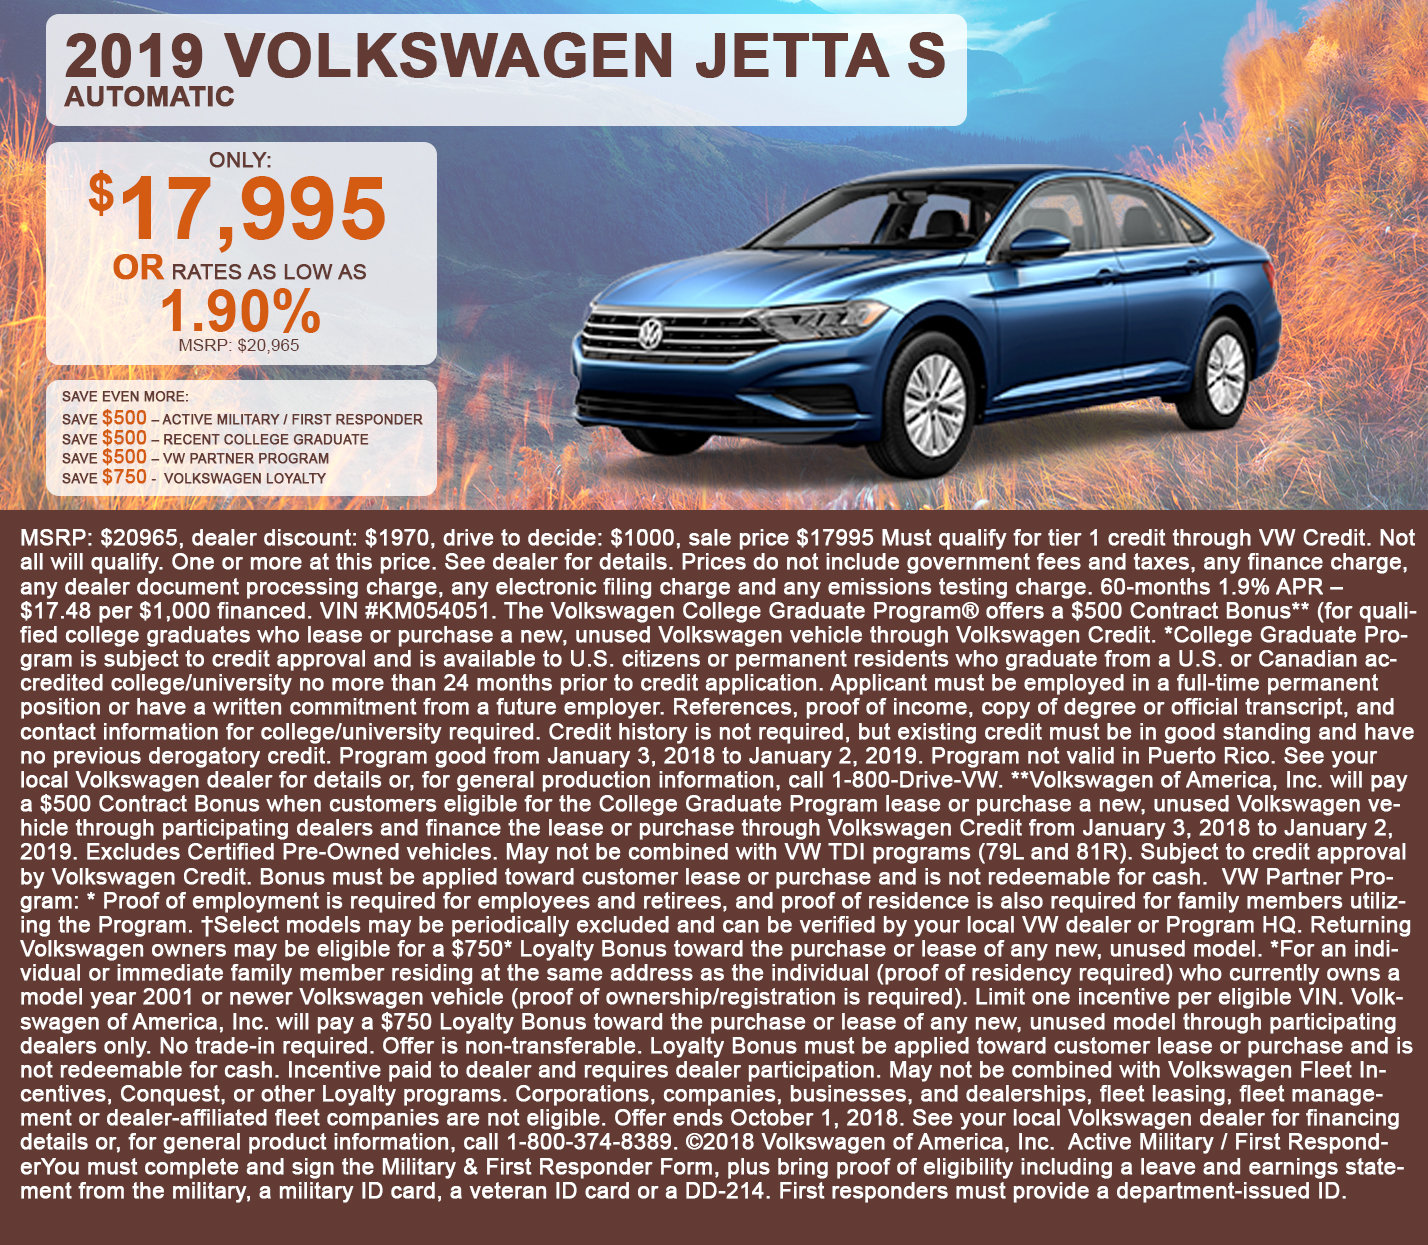 2019 Volkswagen Jetta S Automatic